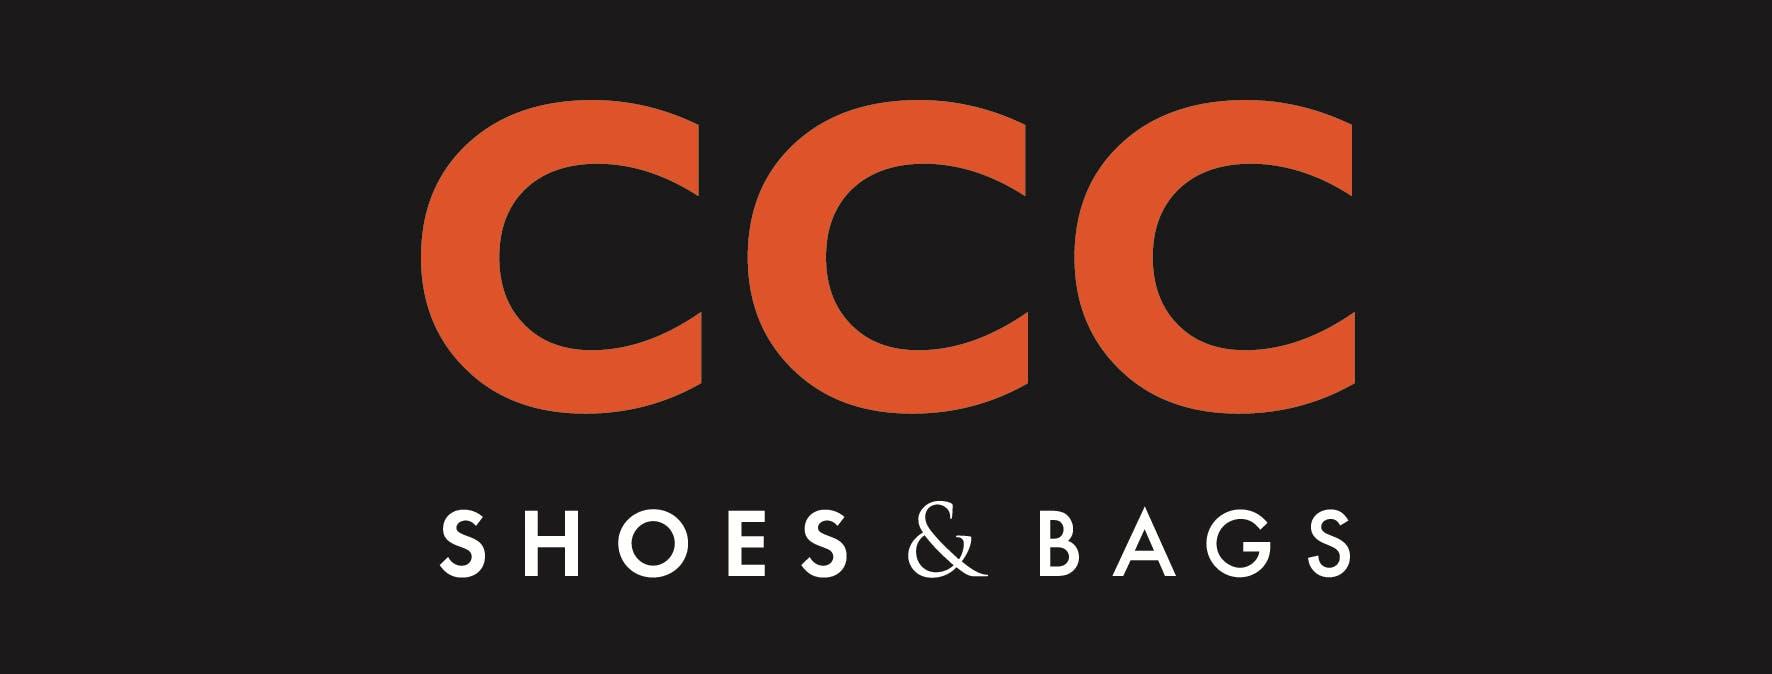 logo_CCC_podstawowe_CMYK